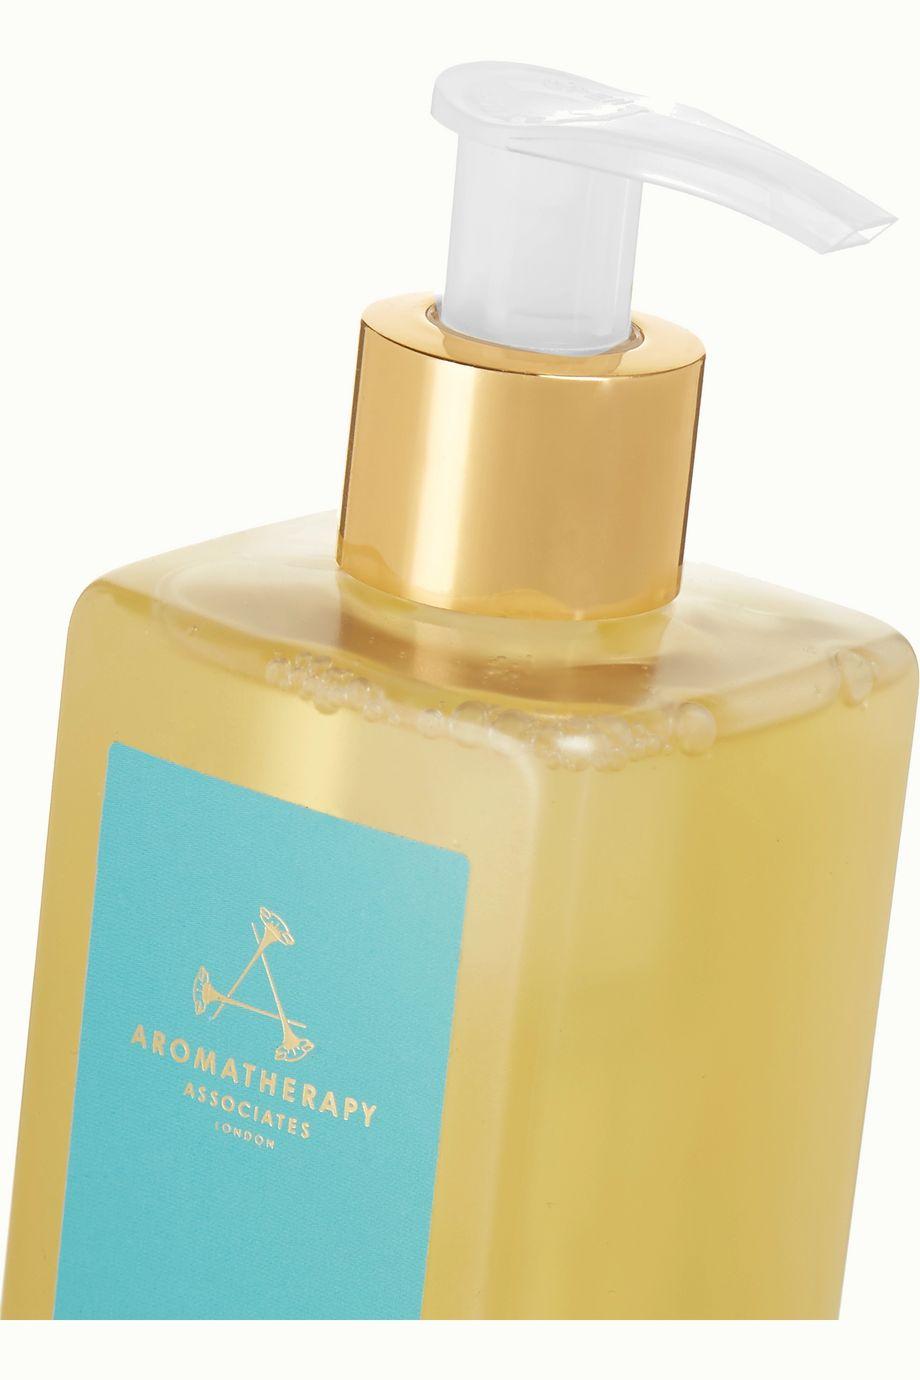 Aromatherapy Associates Revive Body Wash, 250ml